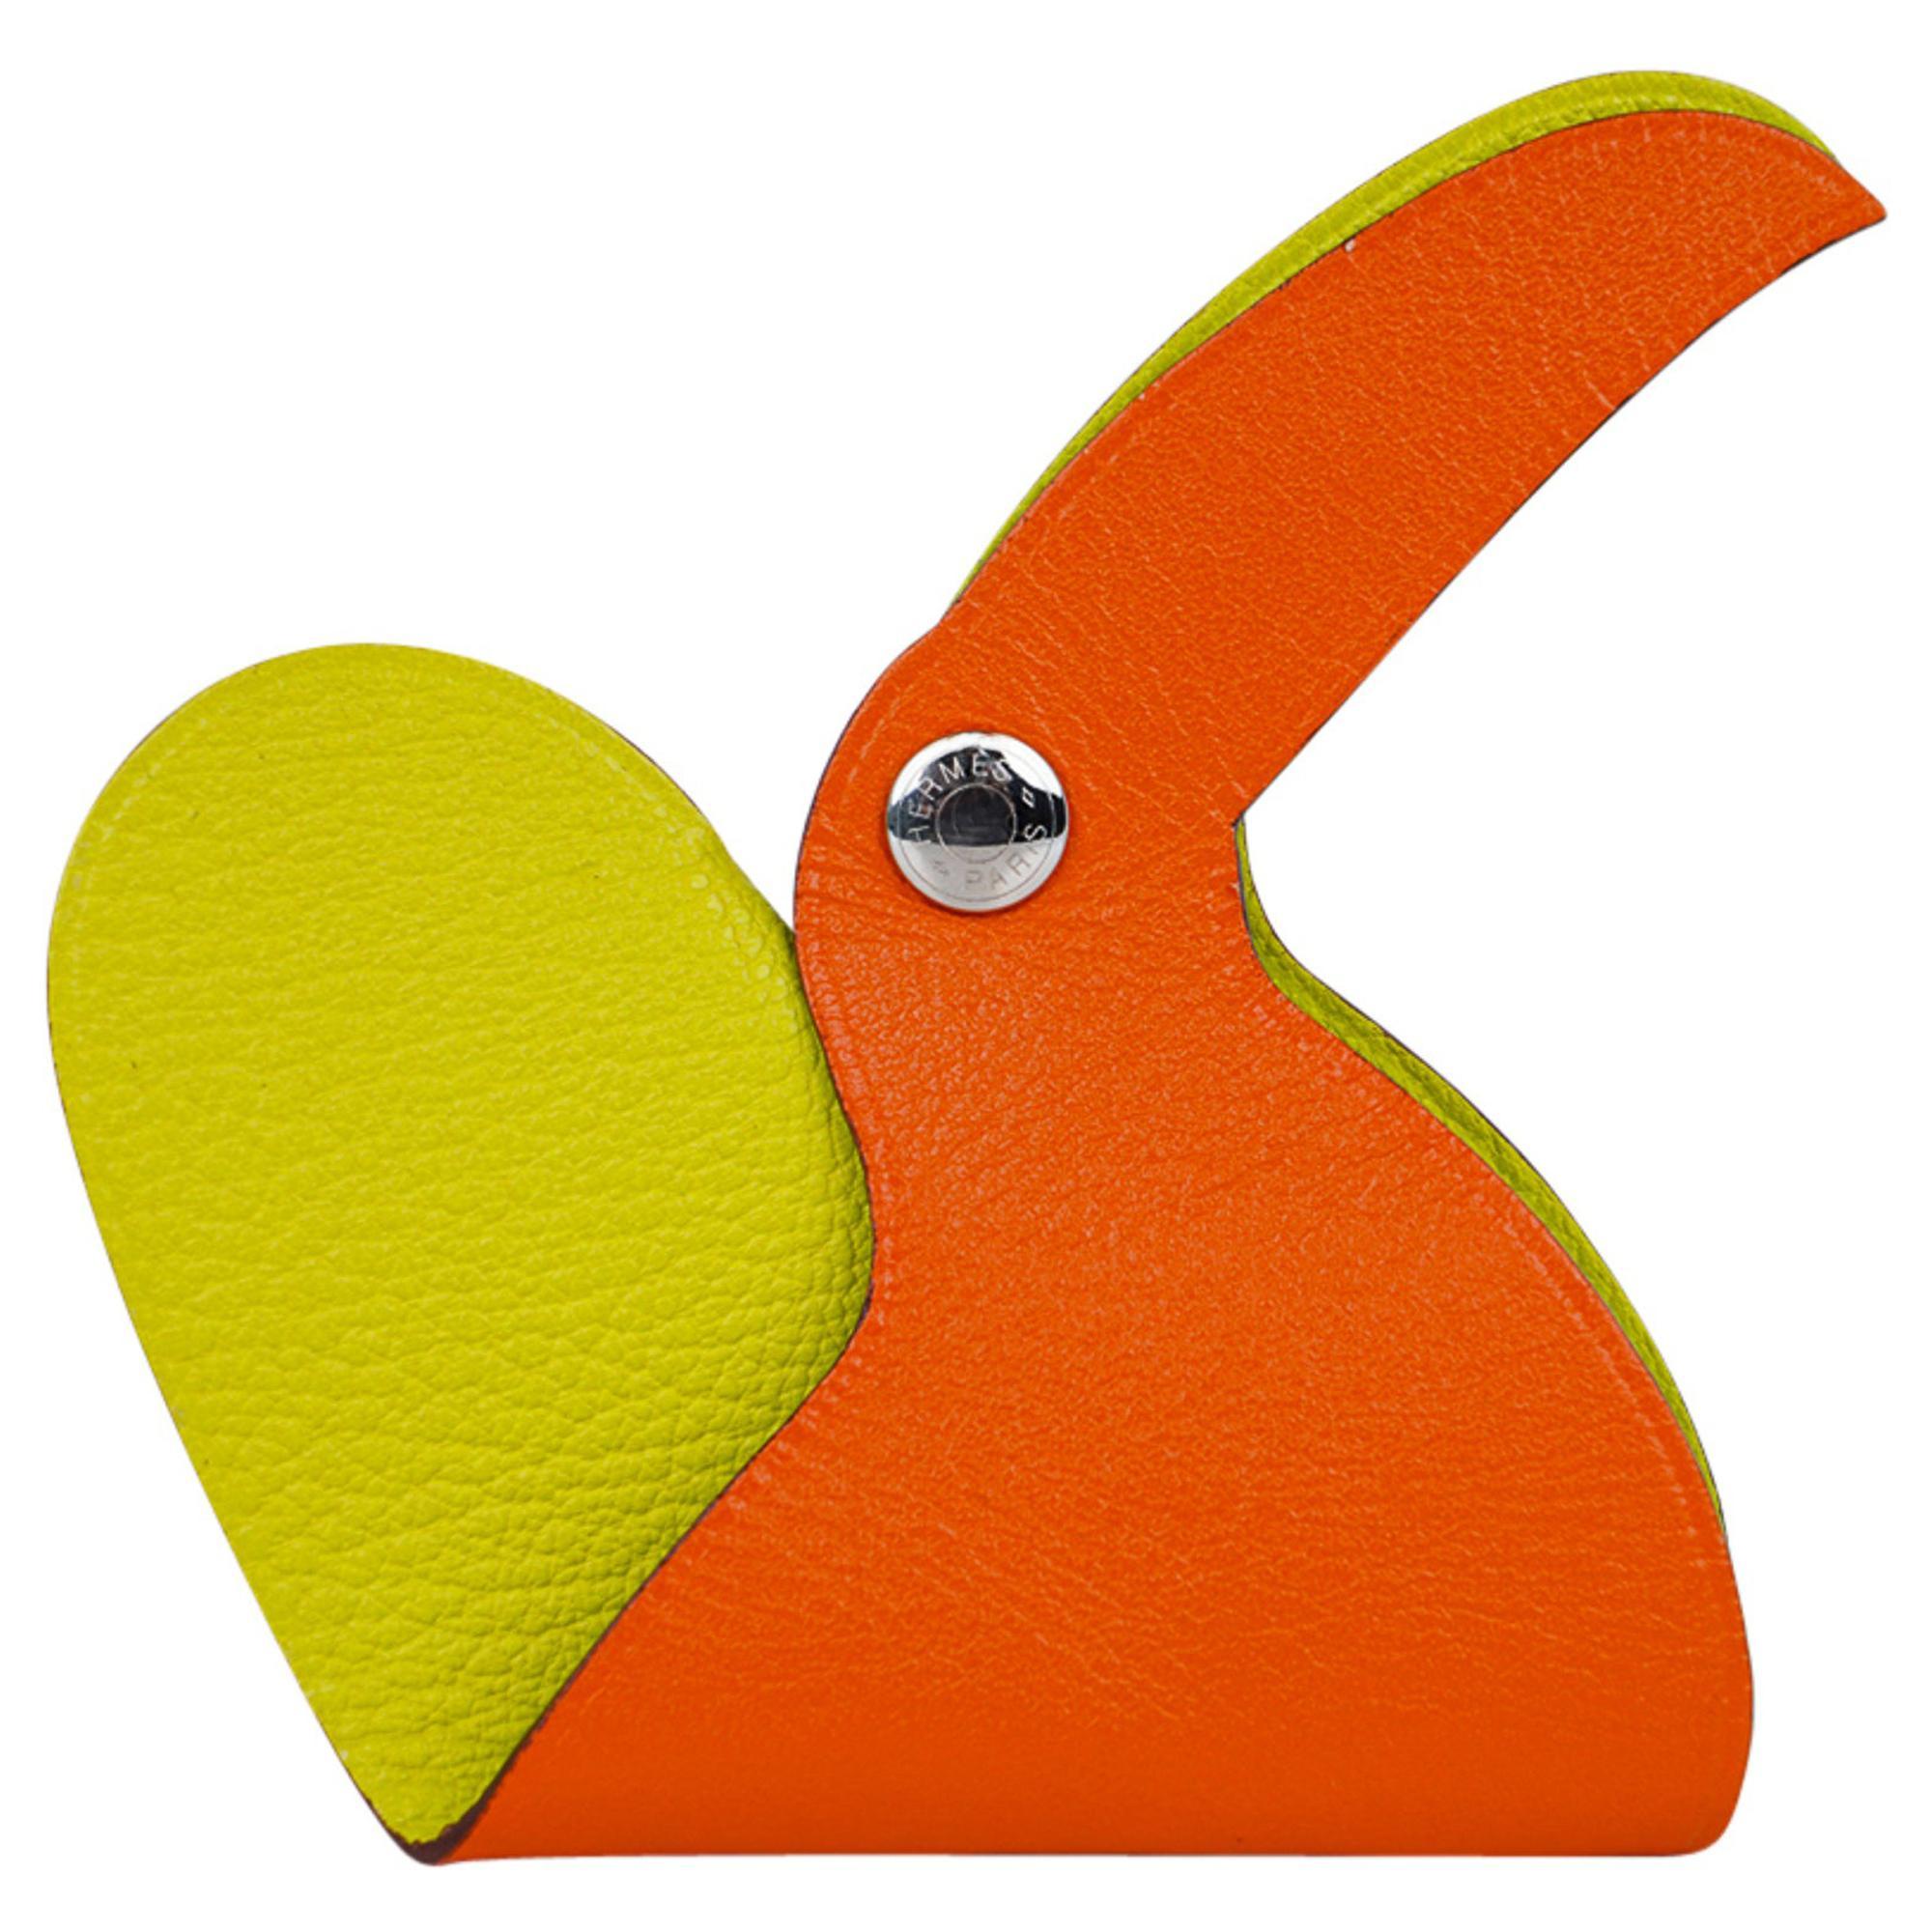 Hermes Clickazoo Toucan Orange / Lime Whimsical Art Piece New w/Box